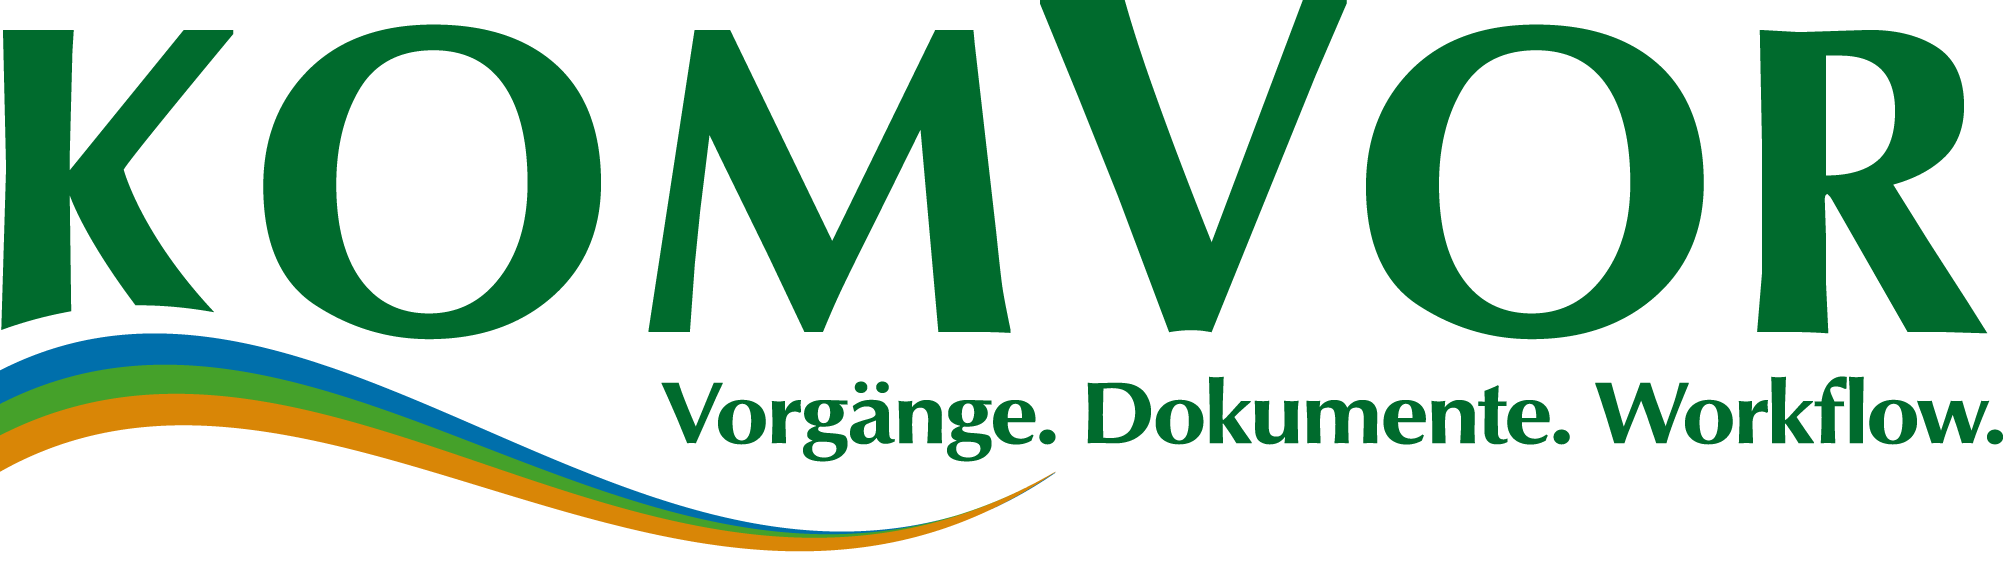 komvor_logo